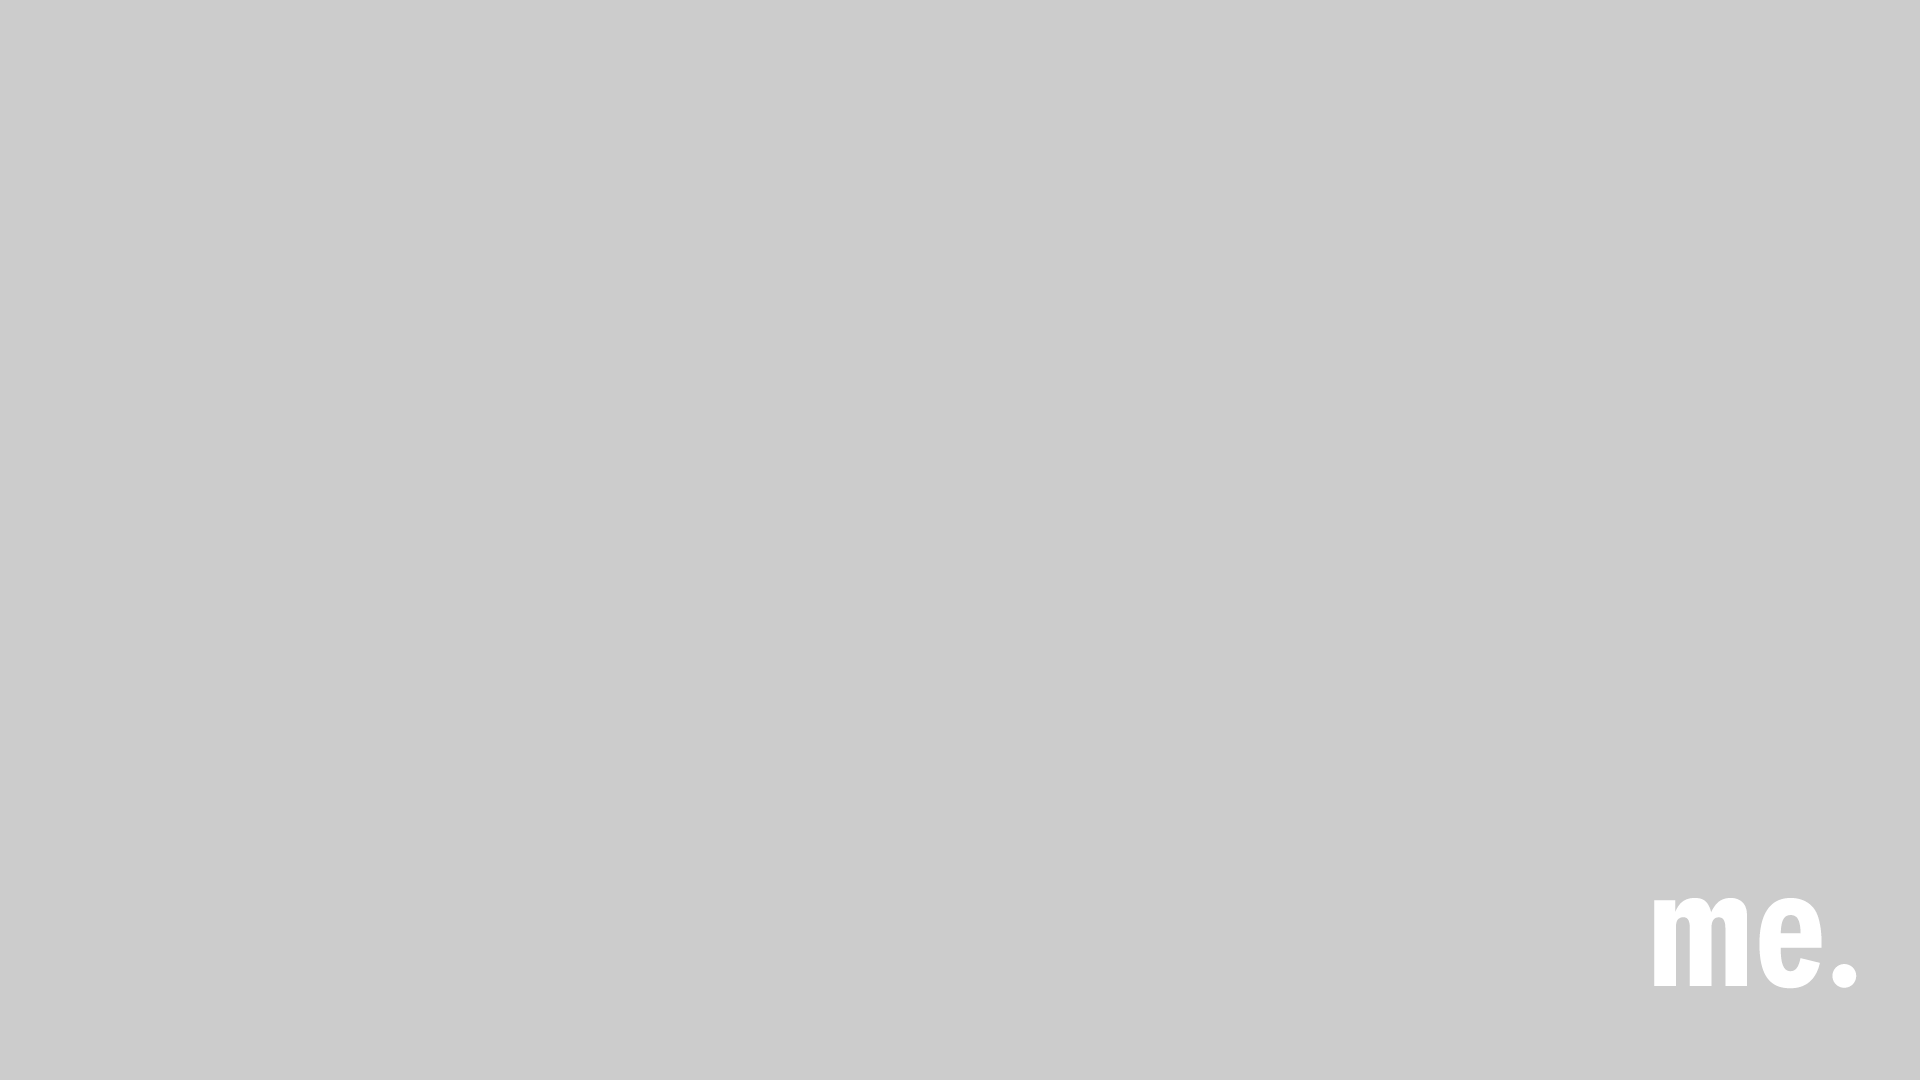 George Reid und Aluna Francis sind AlunaGeorge. Auch live beim Berlin Festival 2013.